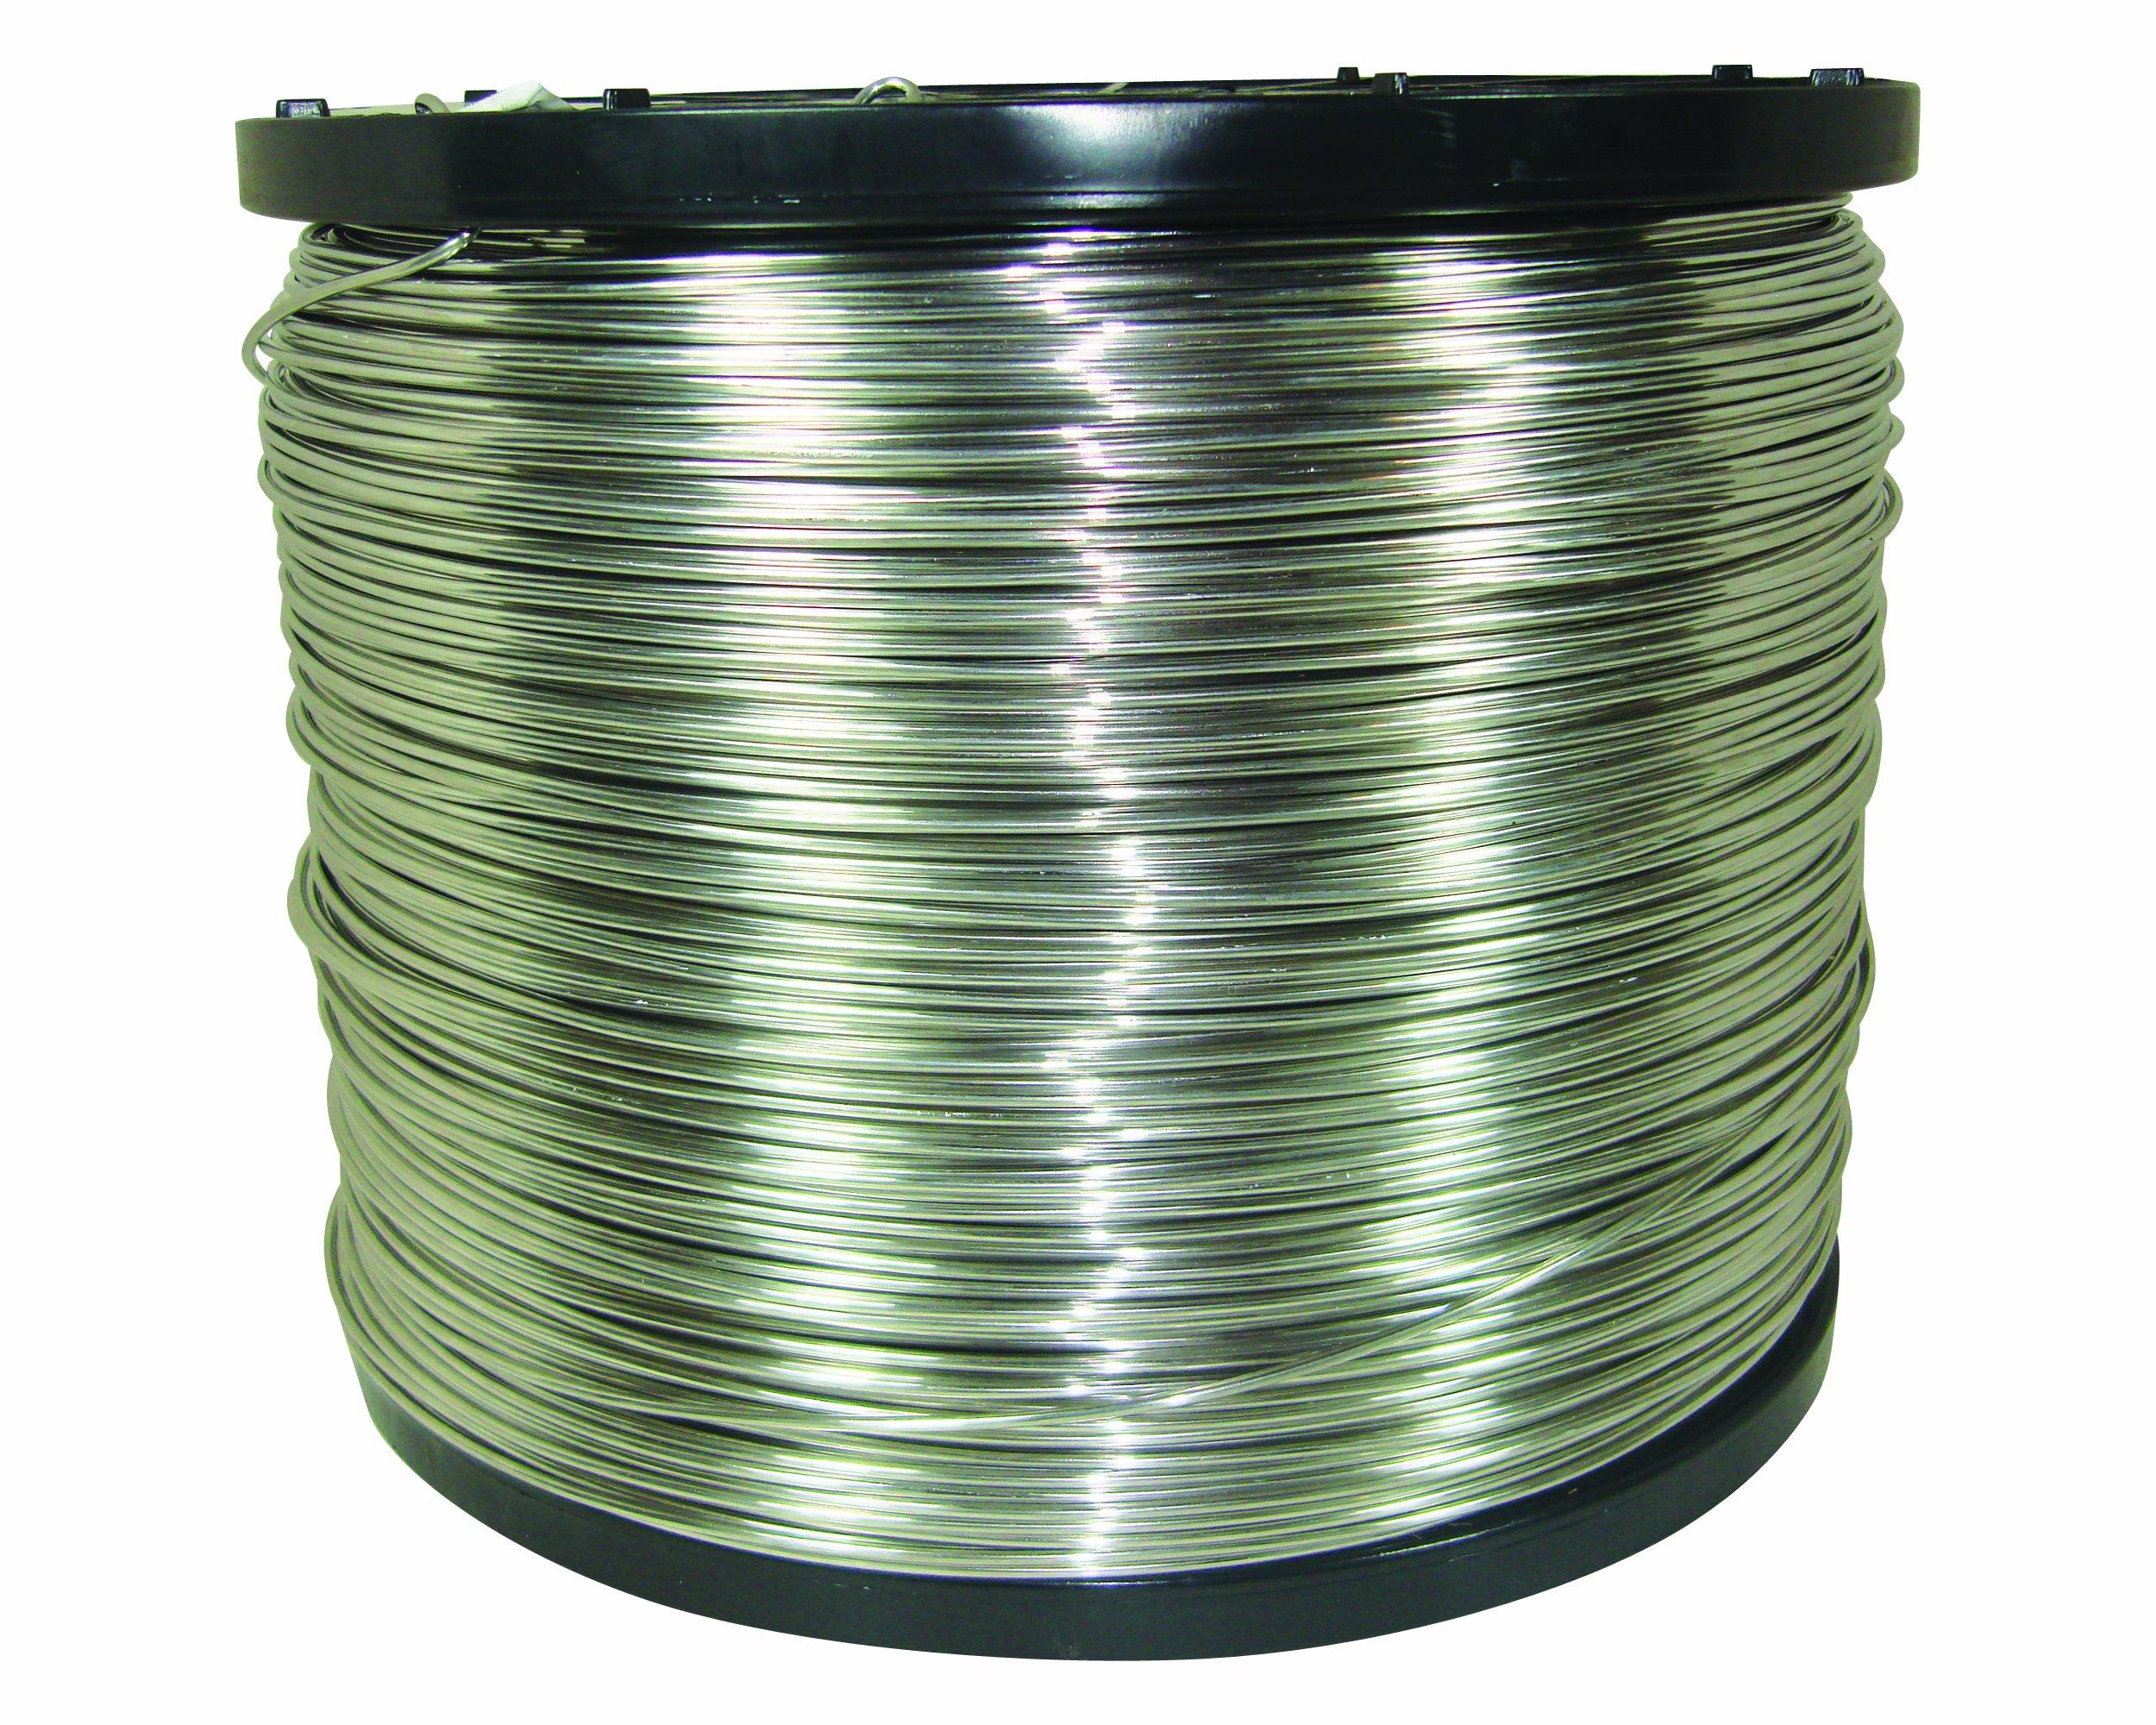 Field Guardian 12-1/2-Guage Aluminum Wire, 1-Mile by Field Guardian